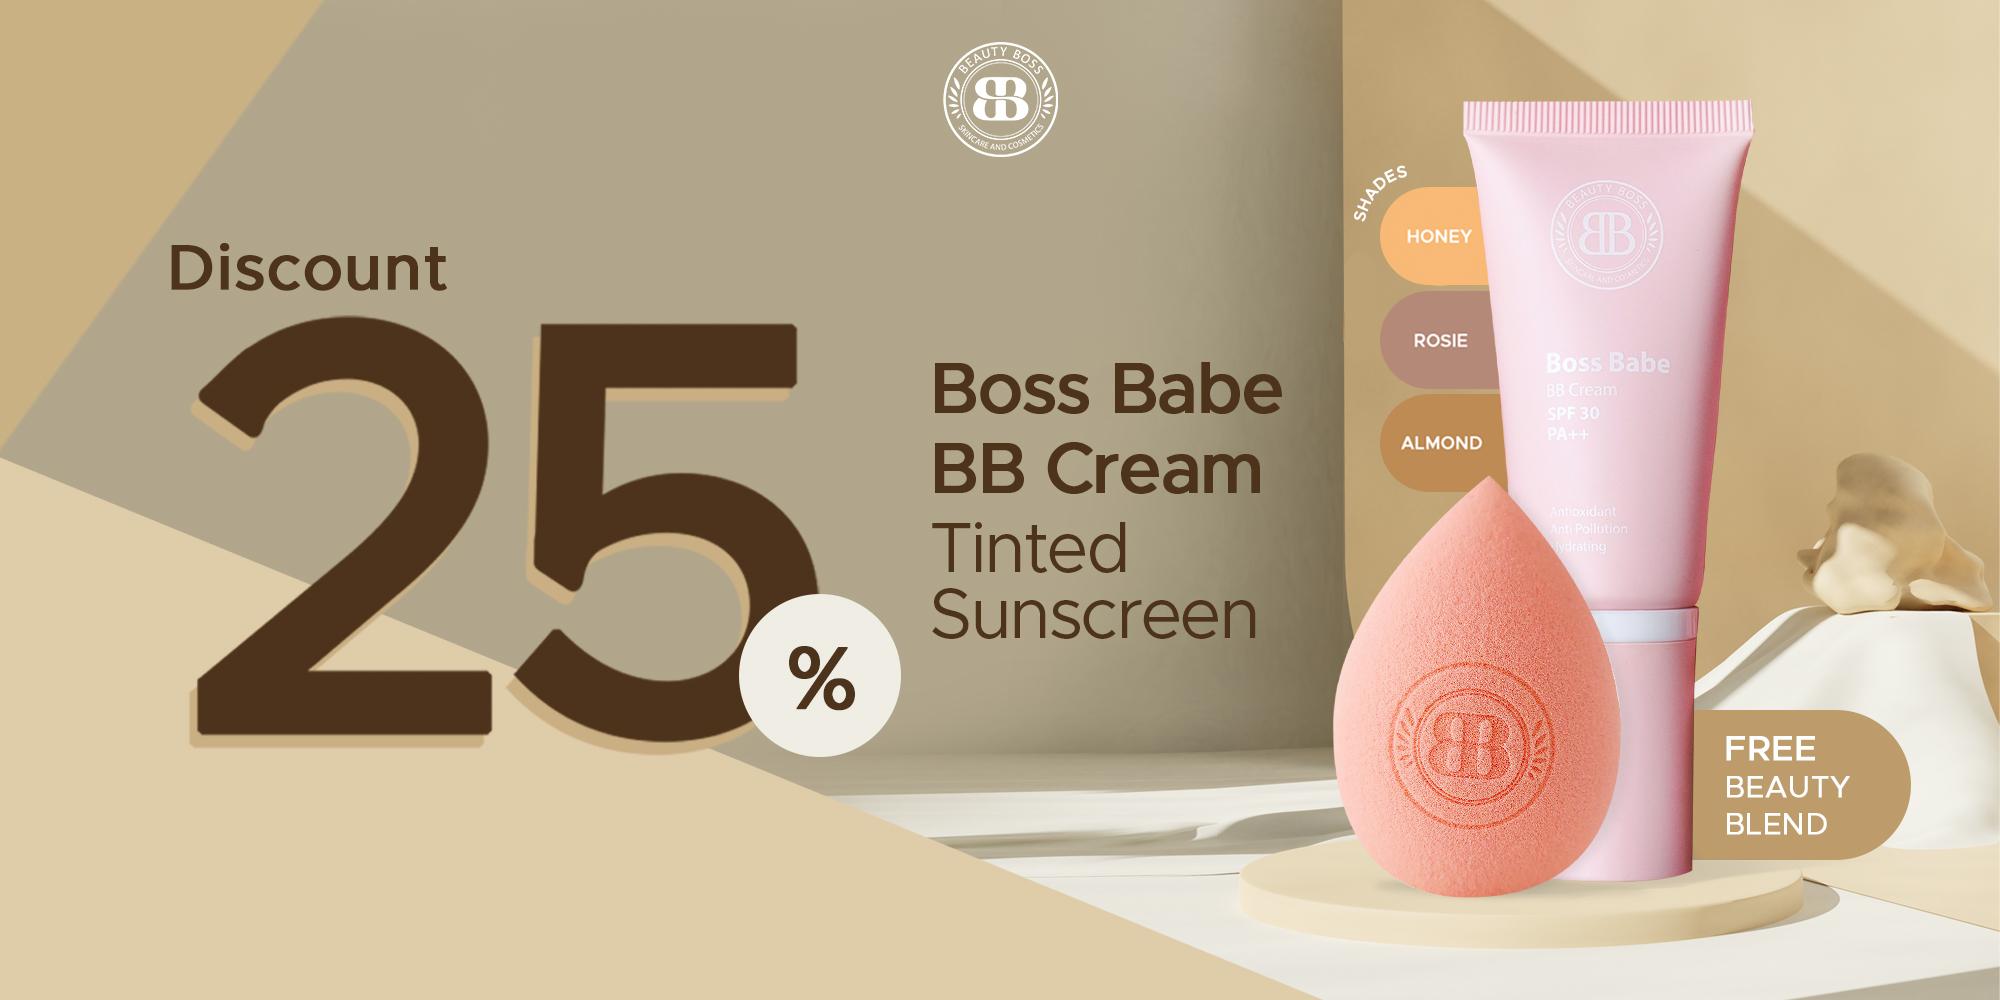 Promo Tinted Sunscreen